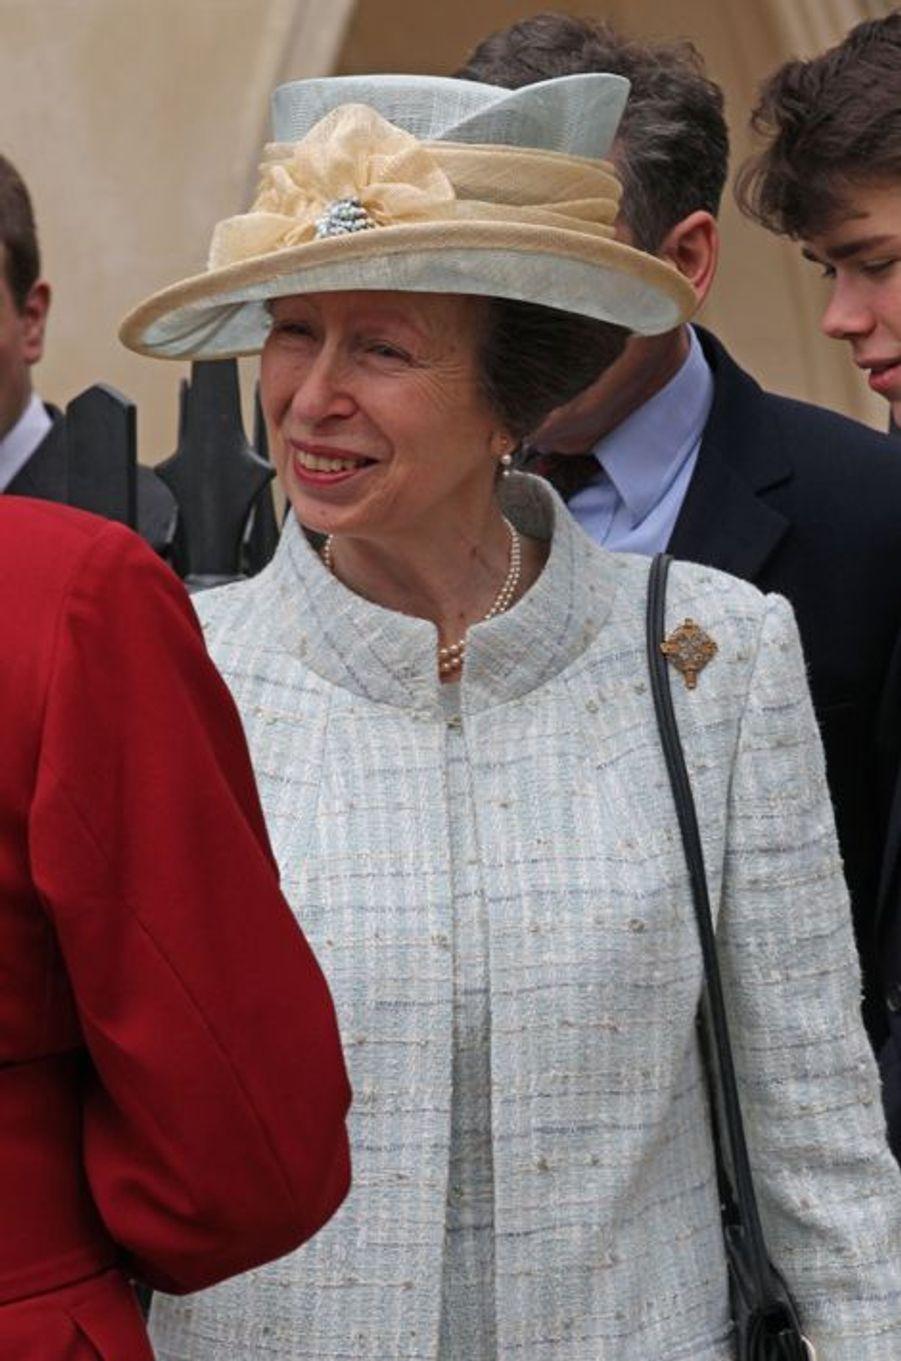 La princesse Anne à Windsor, le 5 avril 2015